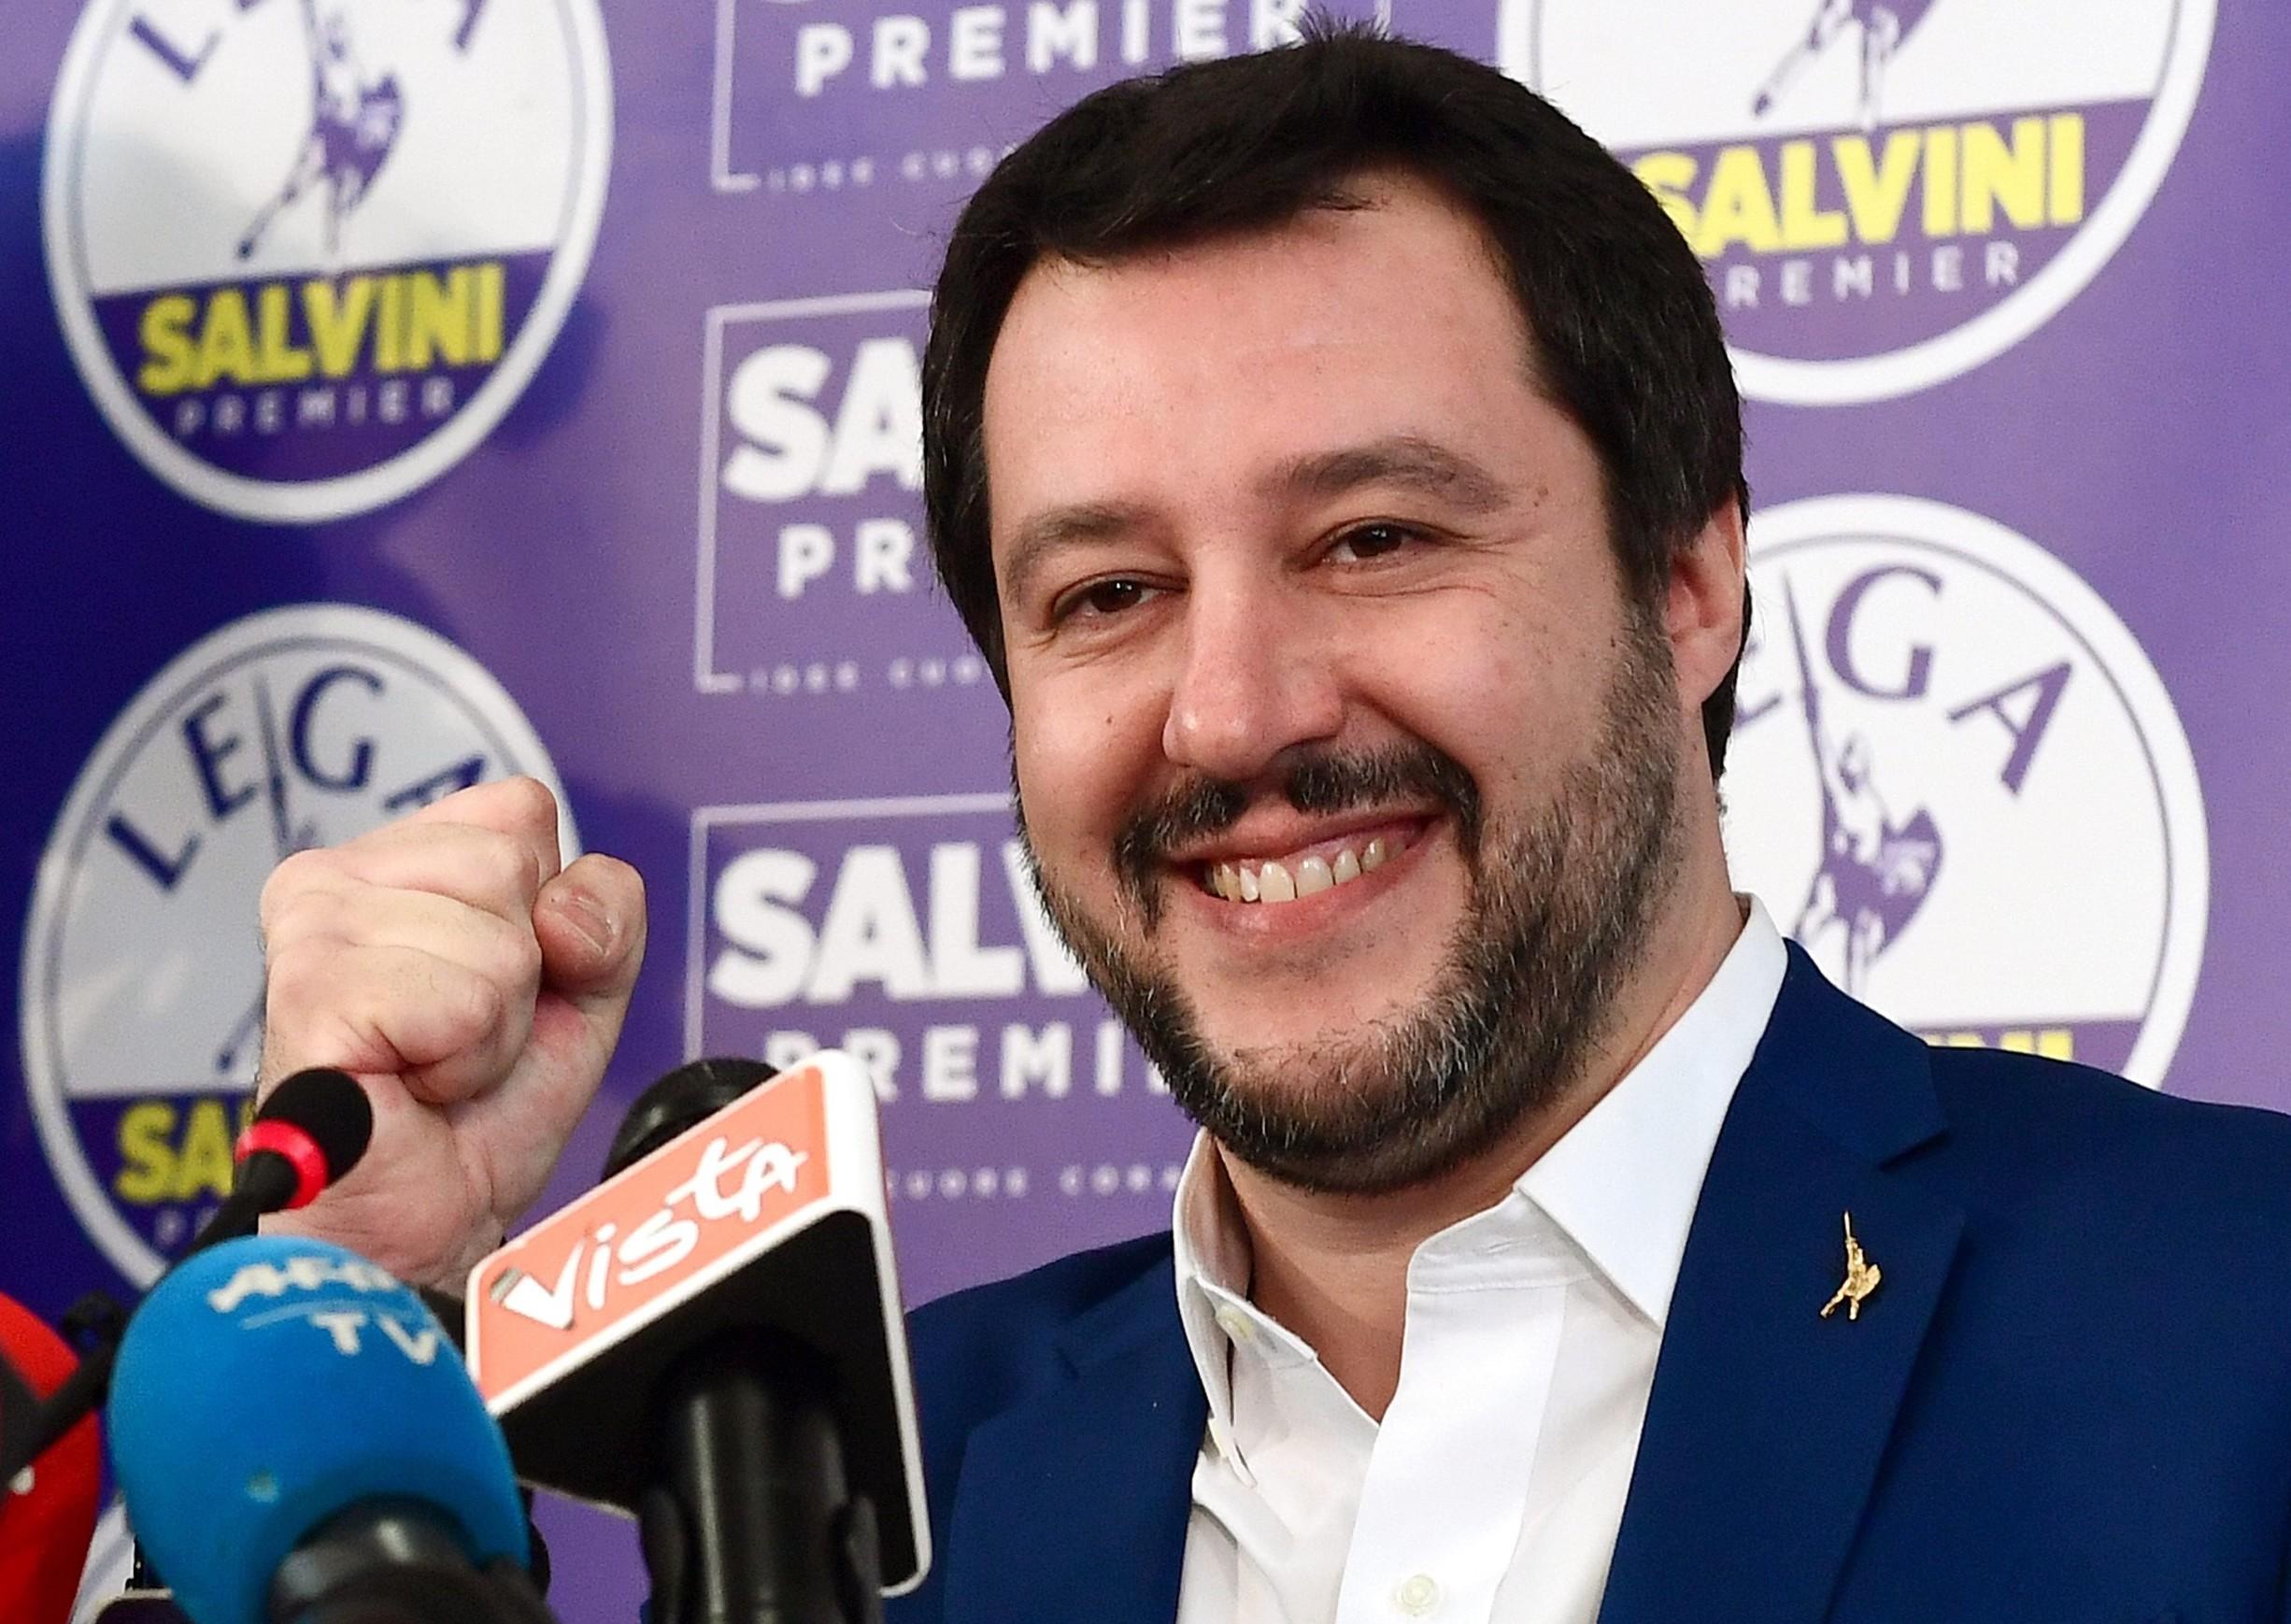 Matteo Salvini età, biografia, stipendio